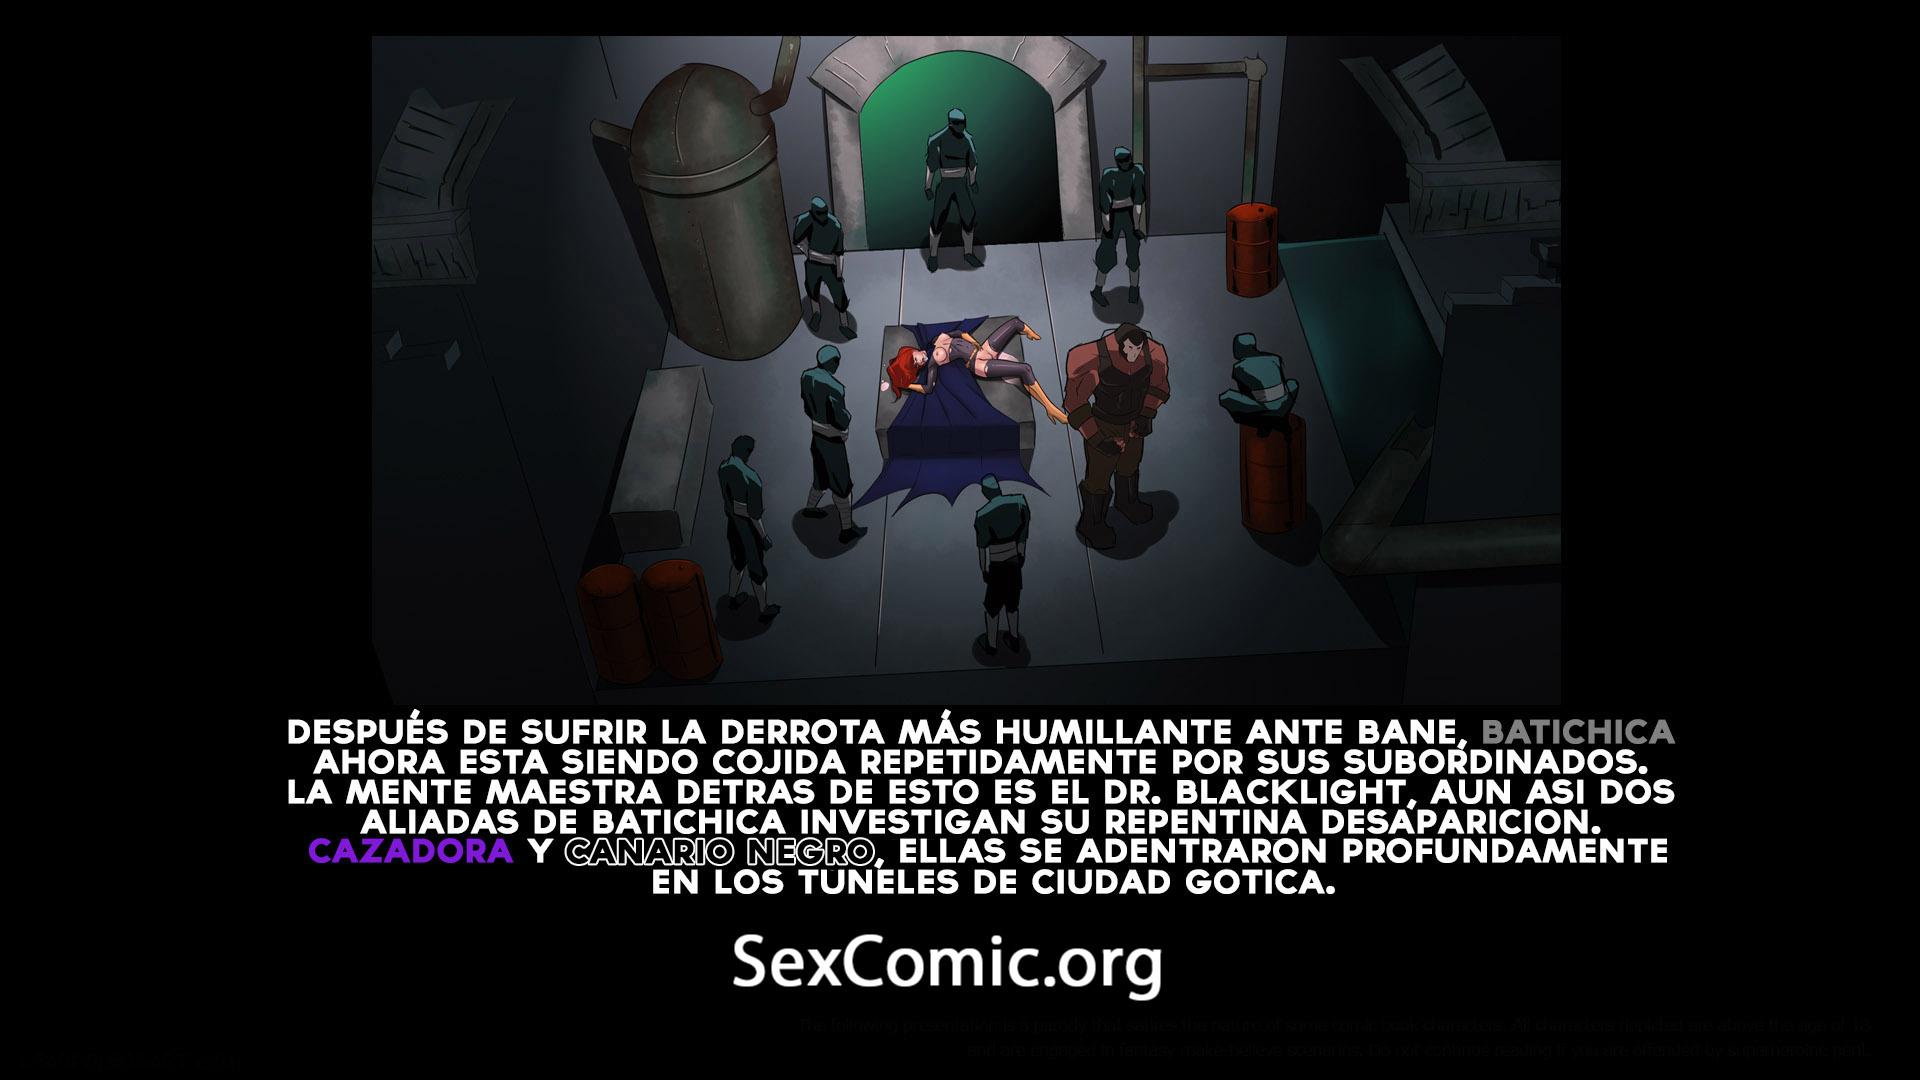 comic-xxx-super-heroes-marvel-historias-eroticas-mangas-sexuales-hentai-videos-pono-comics-de-incesto-gratis-1